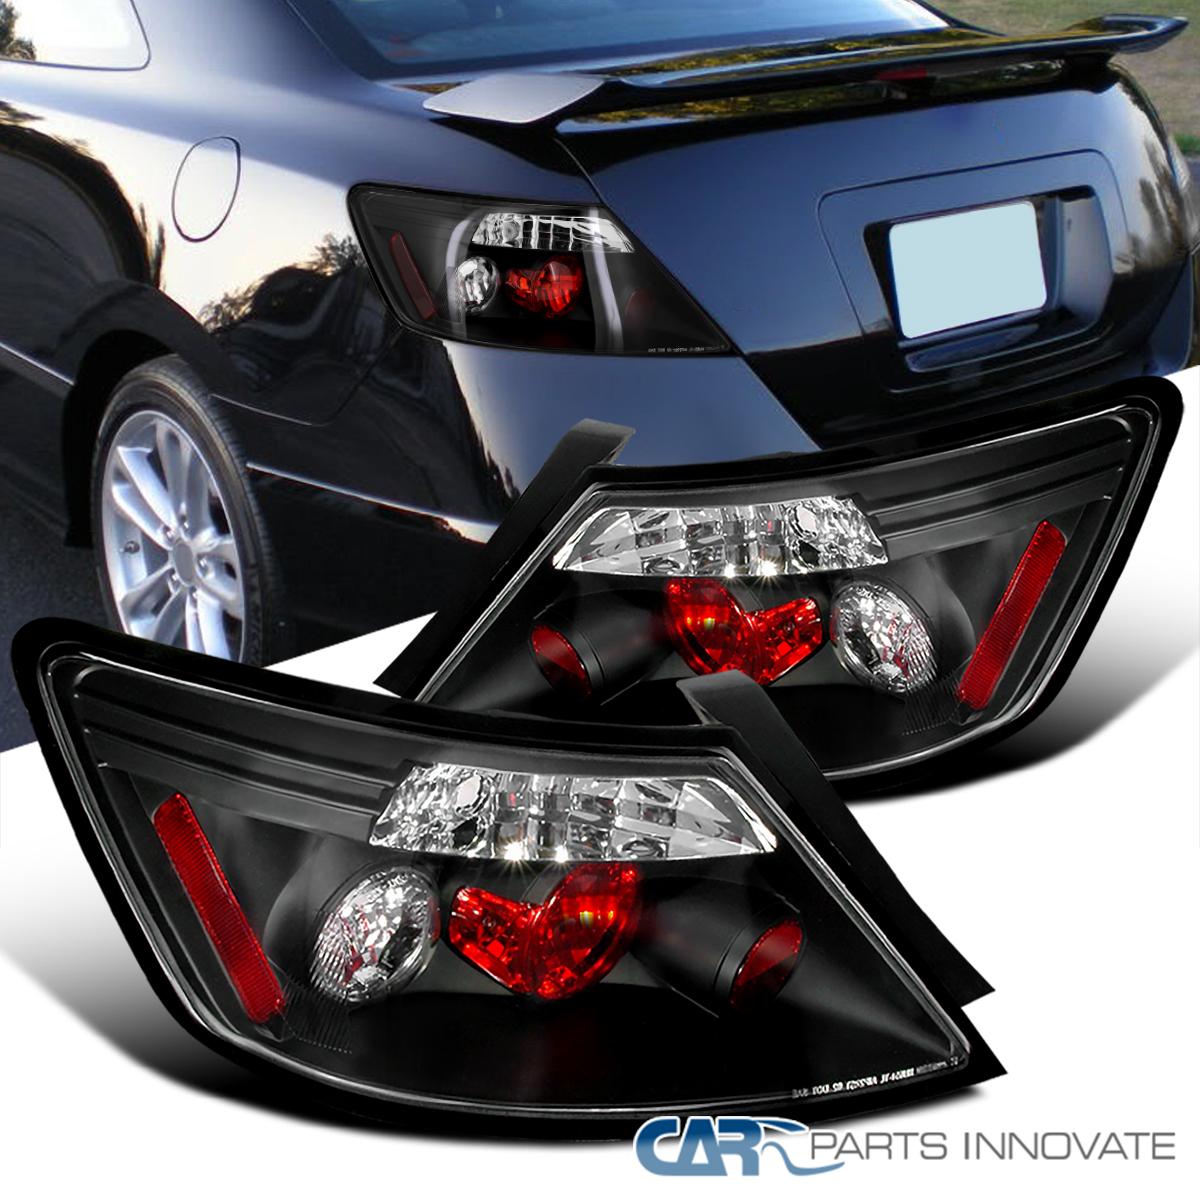 Fit 06-11 Honda Civic 2Dr Coupe Glossy Black Rear Smoke Tail Lights